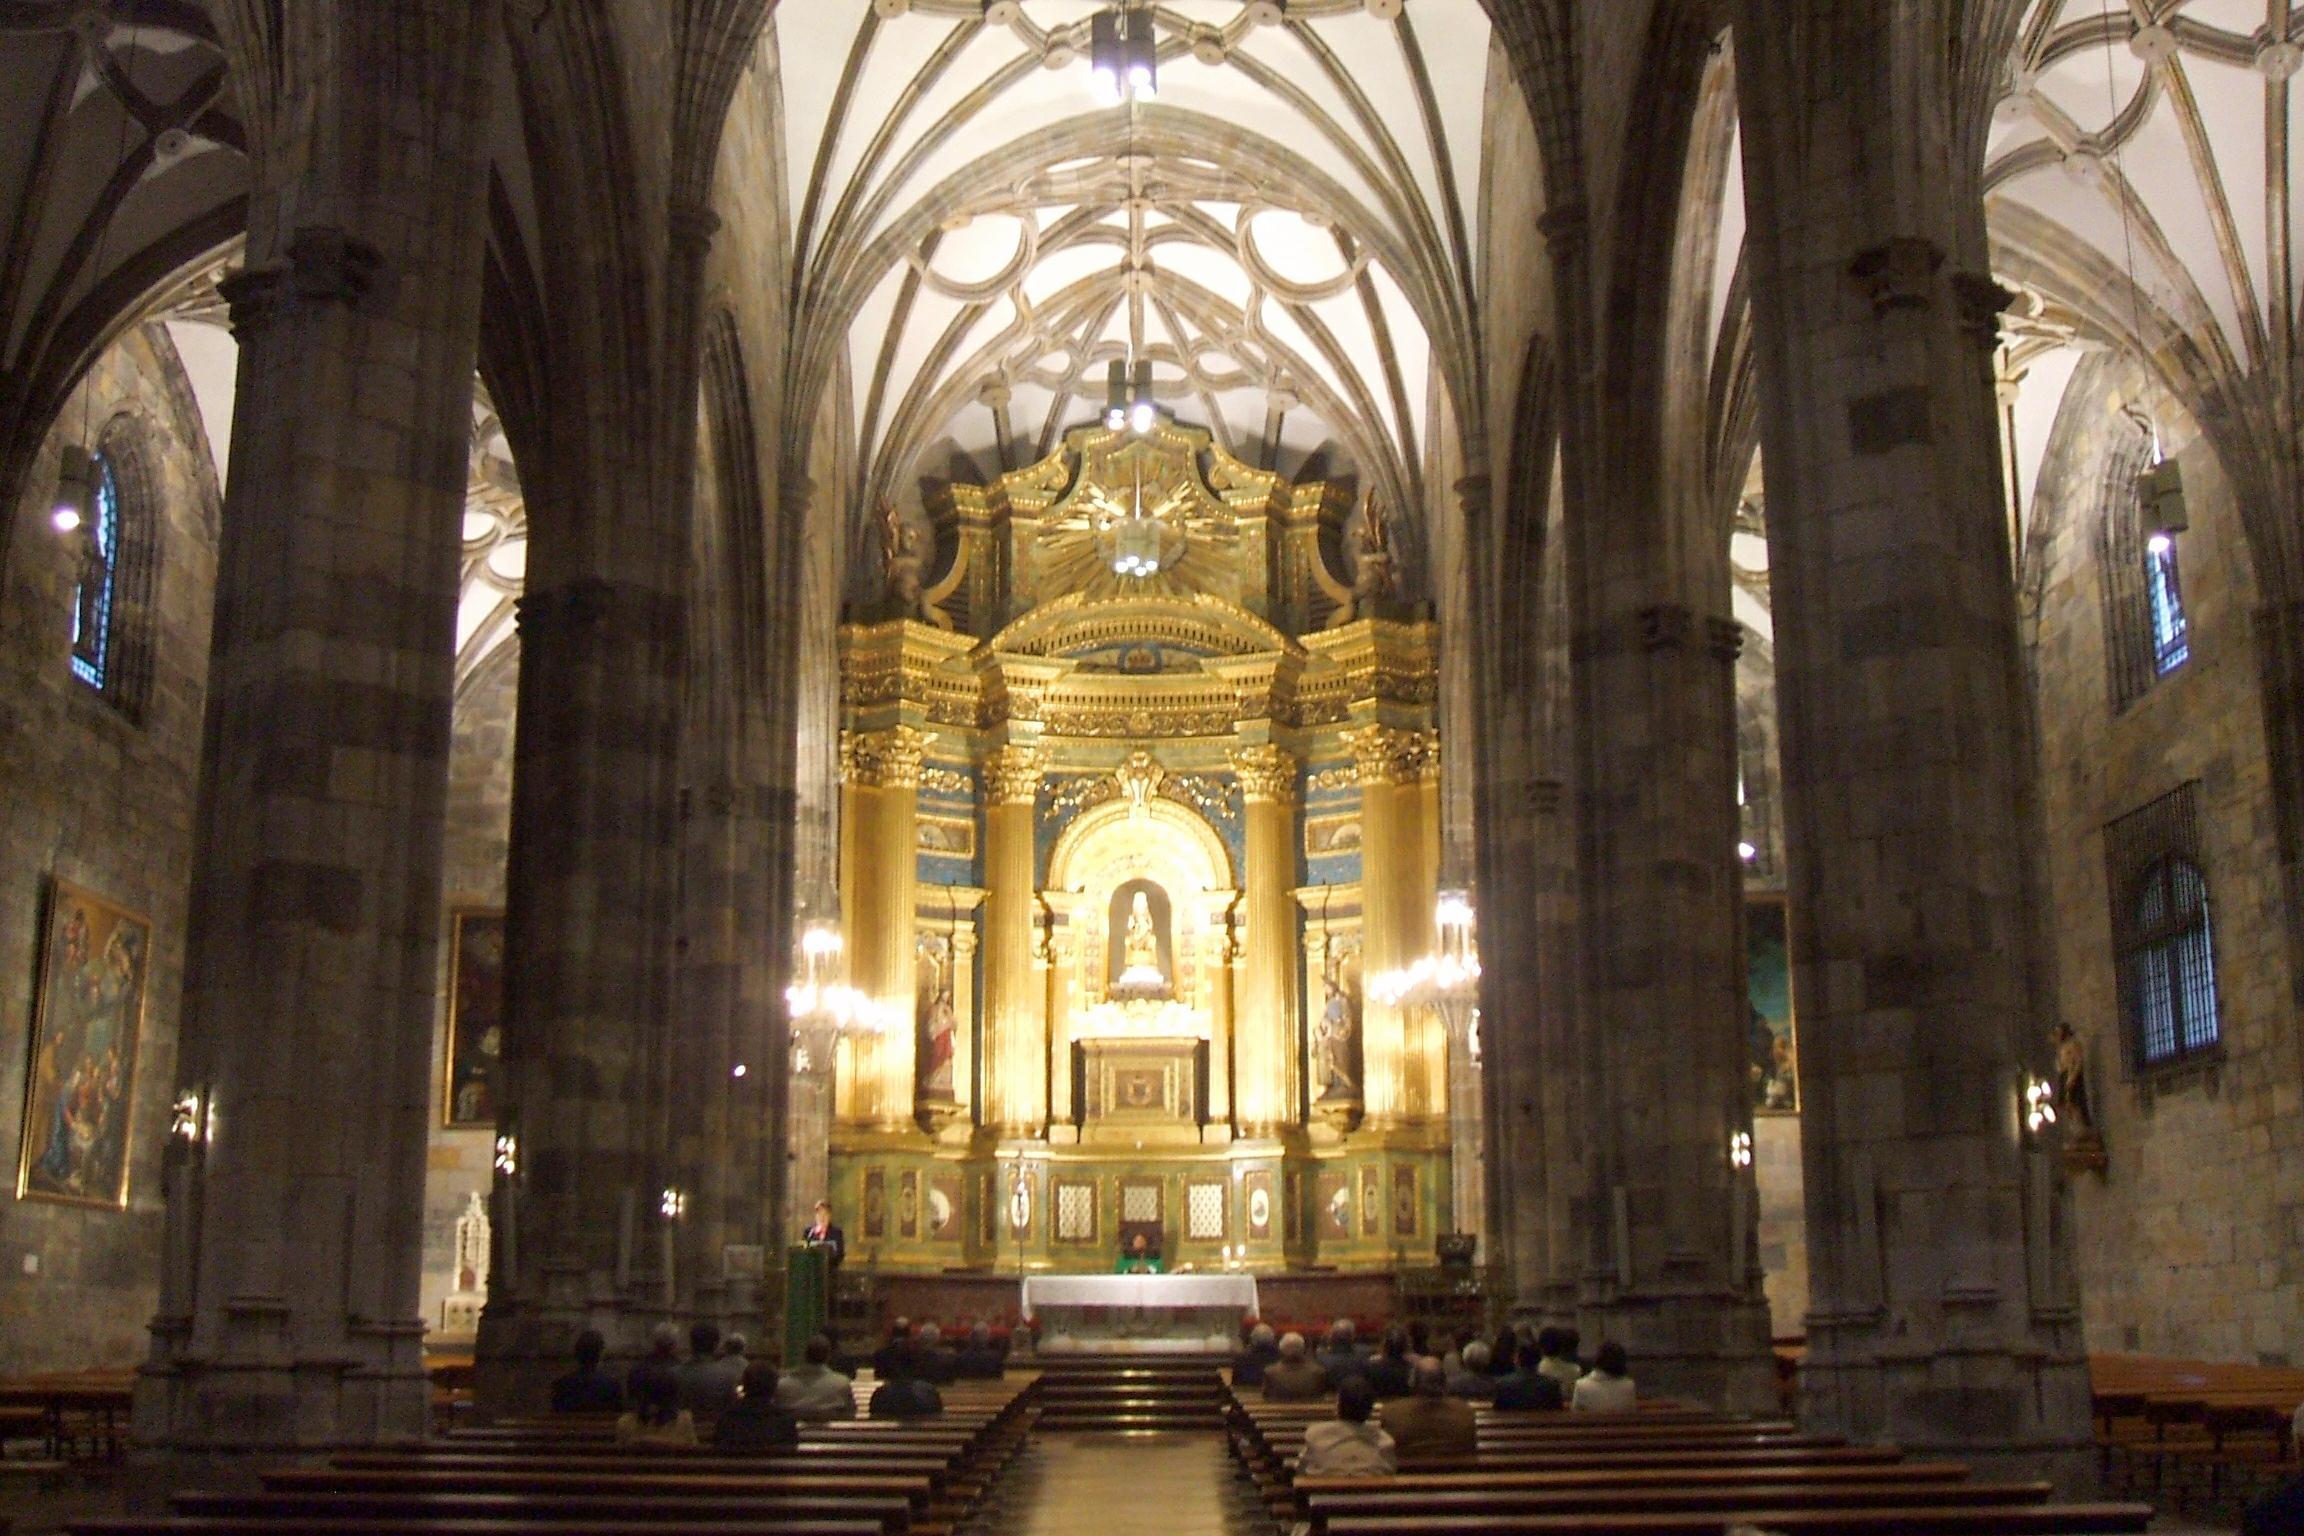 File:Bilbao - Basilica de Begoña 05.JPG - Wikimedia Commons